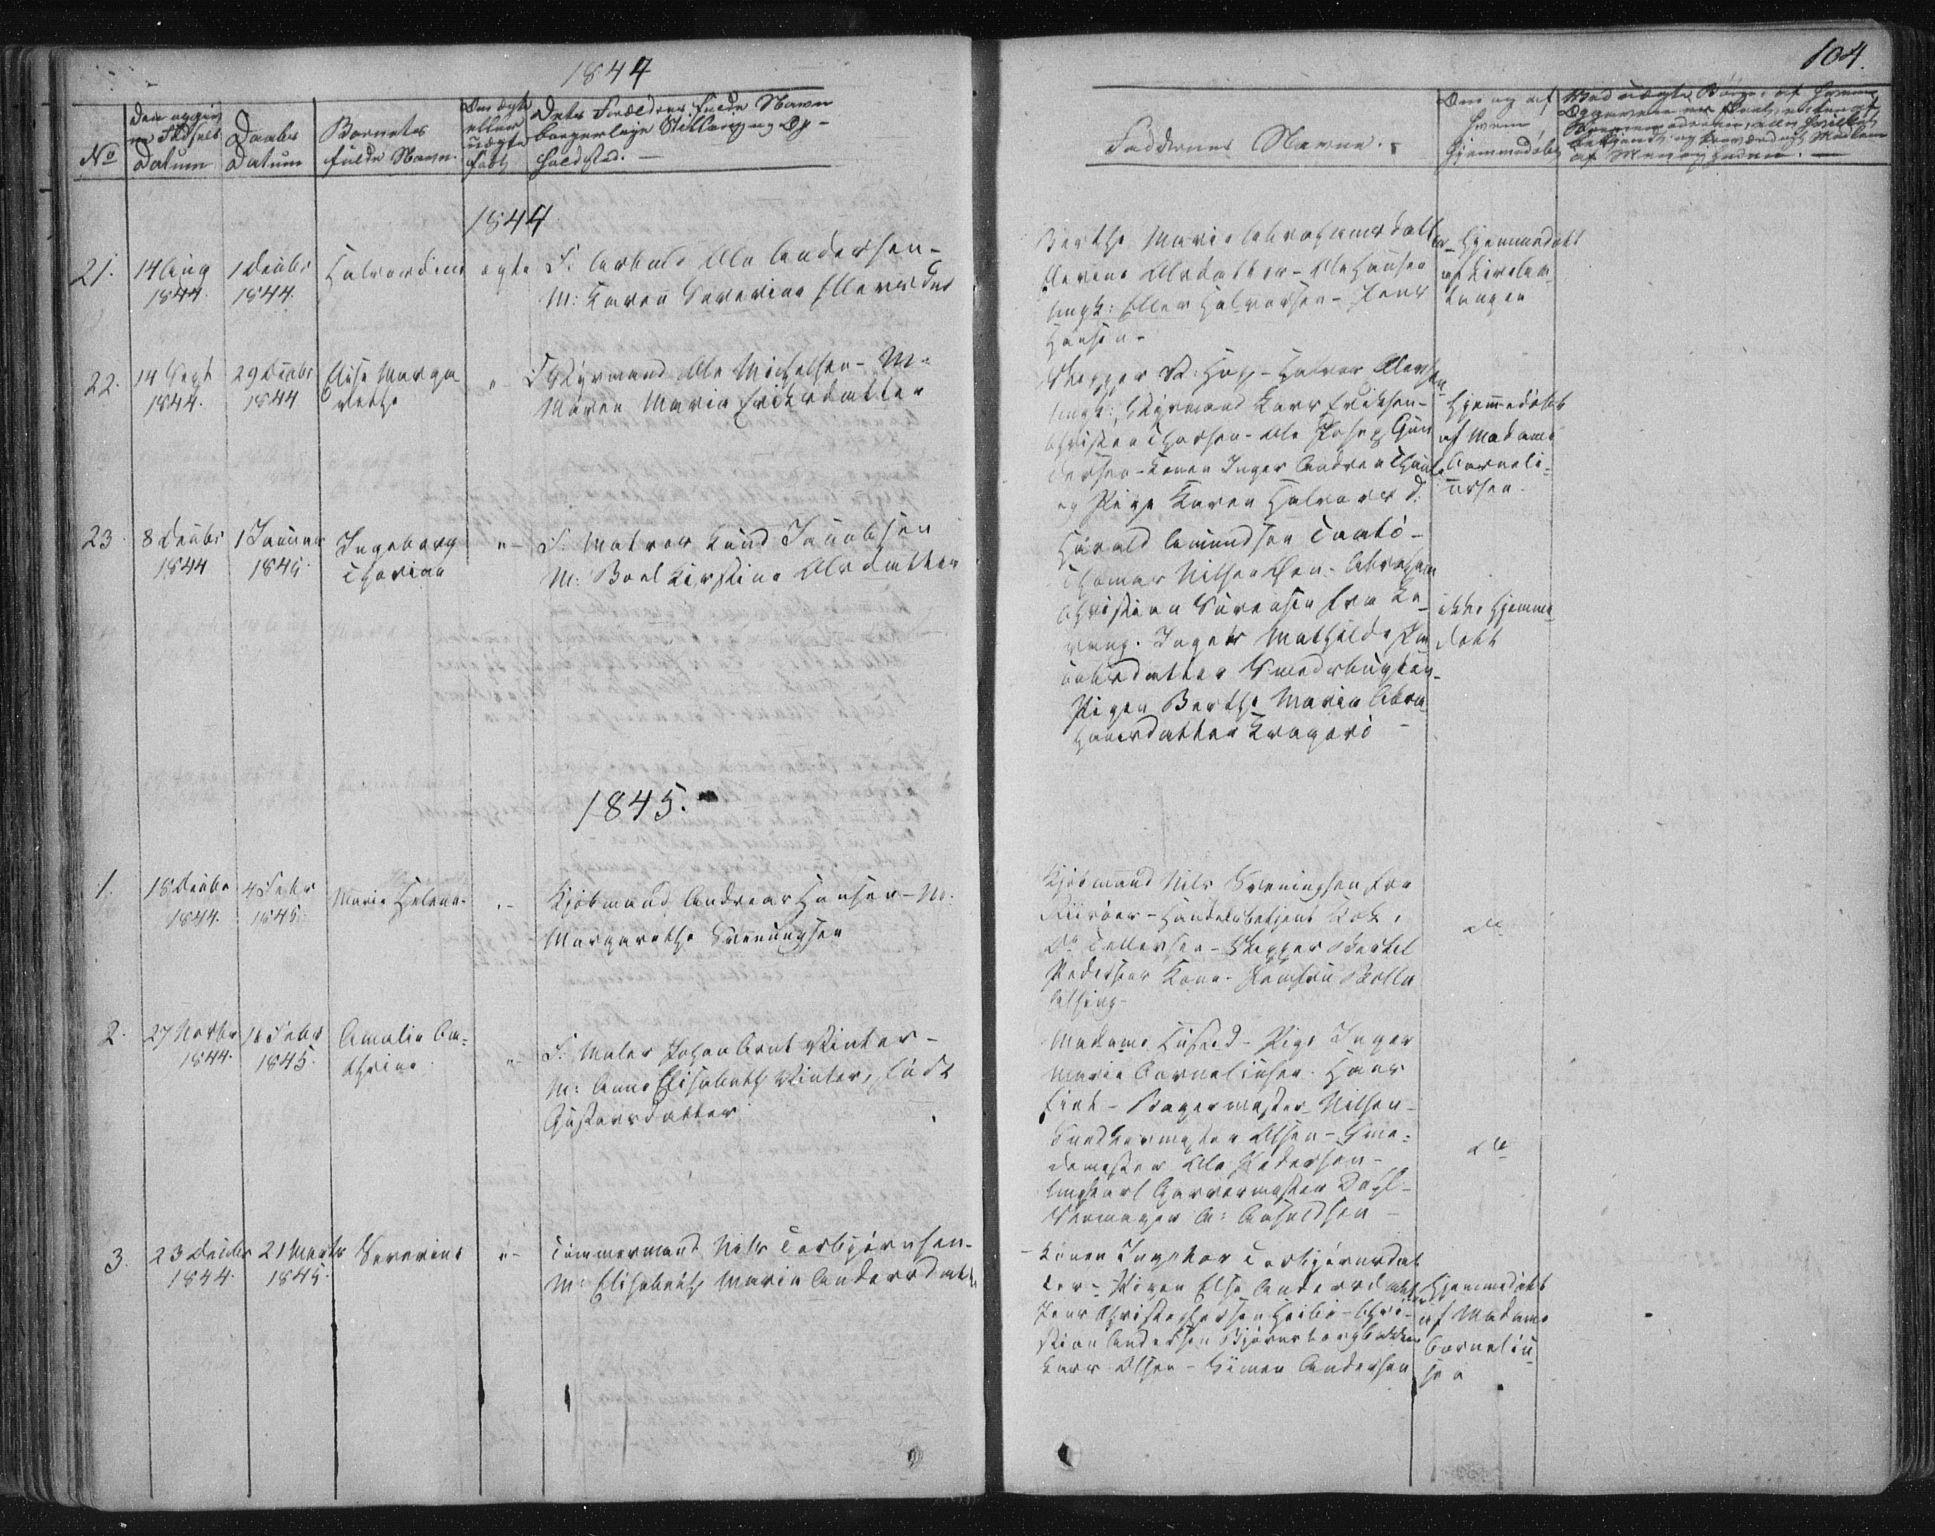 SAKO, Kragerø kirkebøker, F/Fa/L0005: Ministerialbok nr. 5, 1832-1847, s. 104